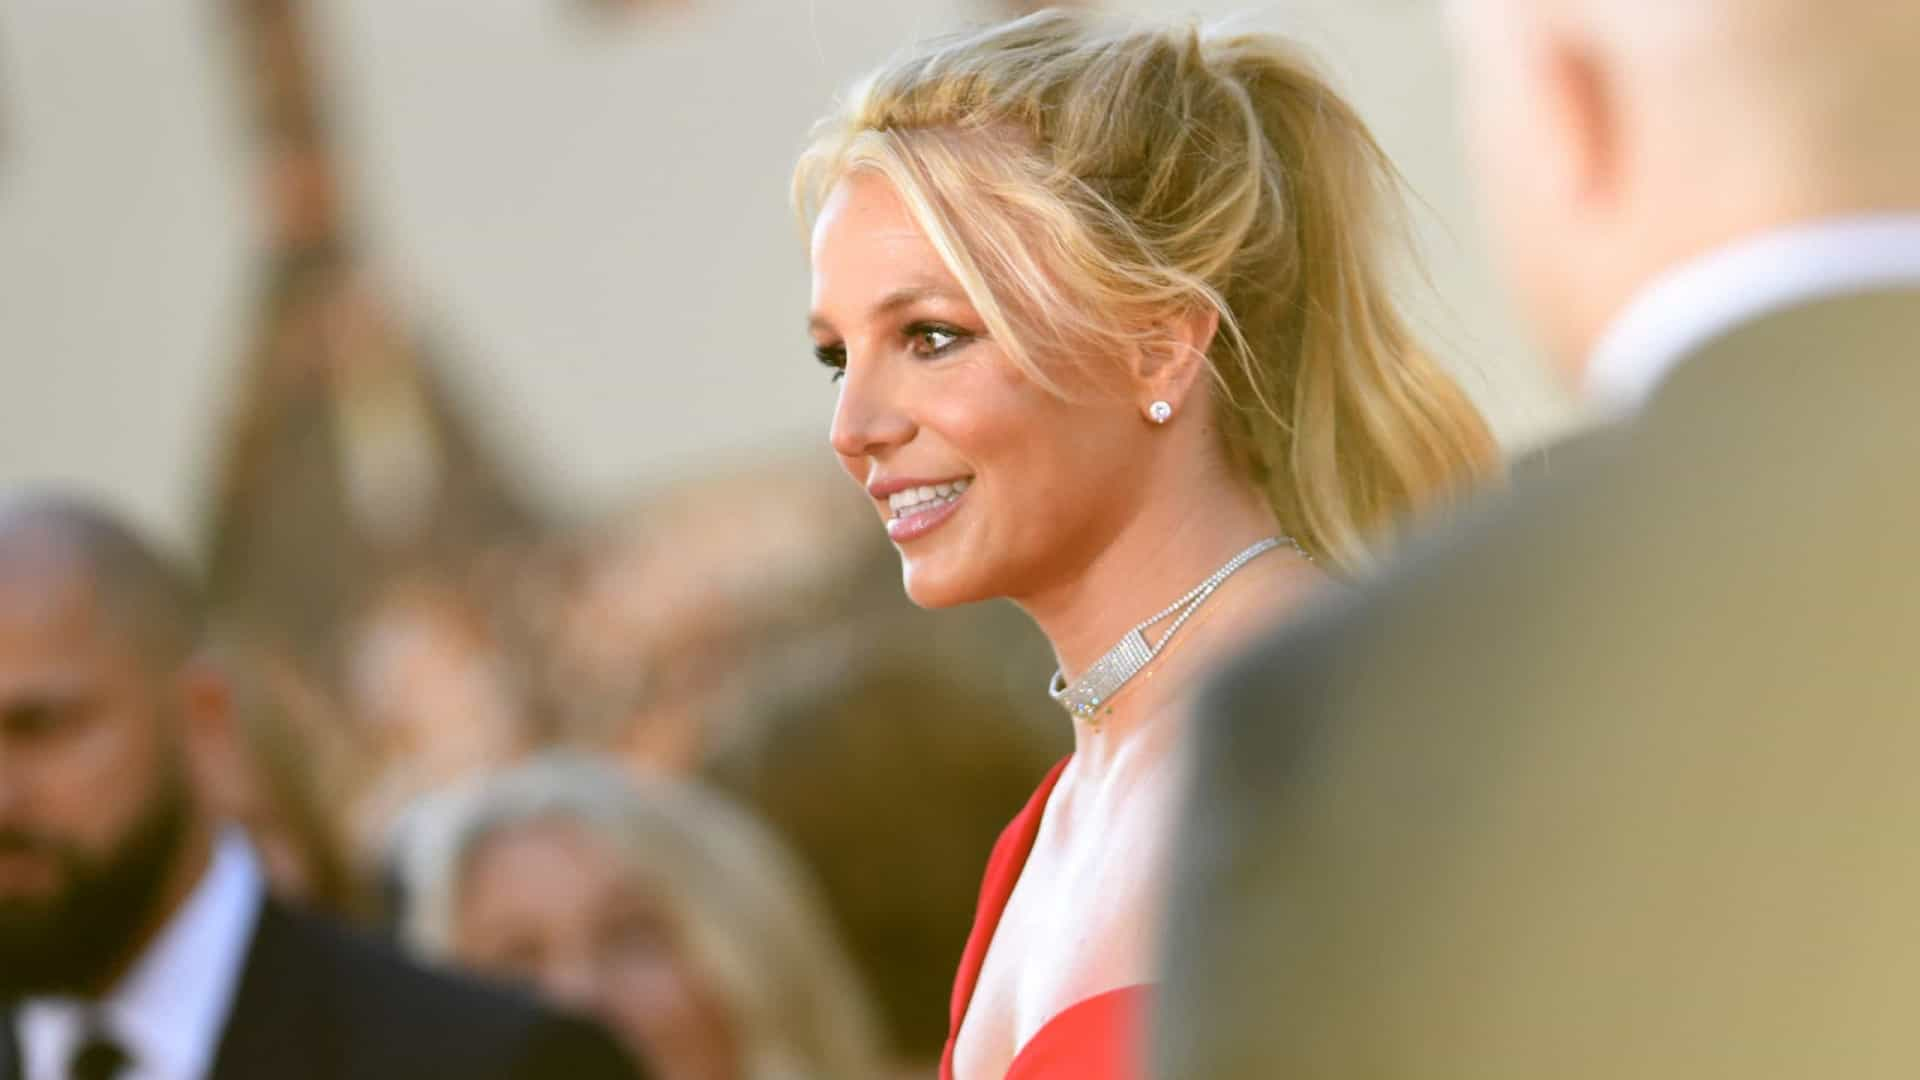 Pink chama de injustas tentativas de criar rivalidade entre Britney Spears e ela